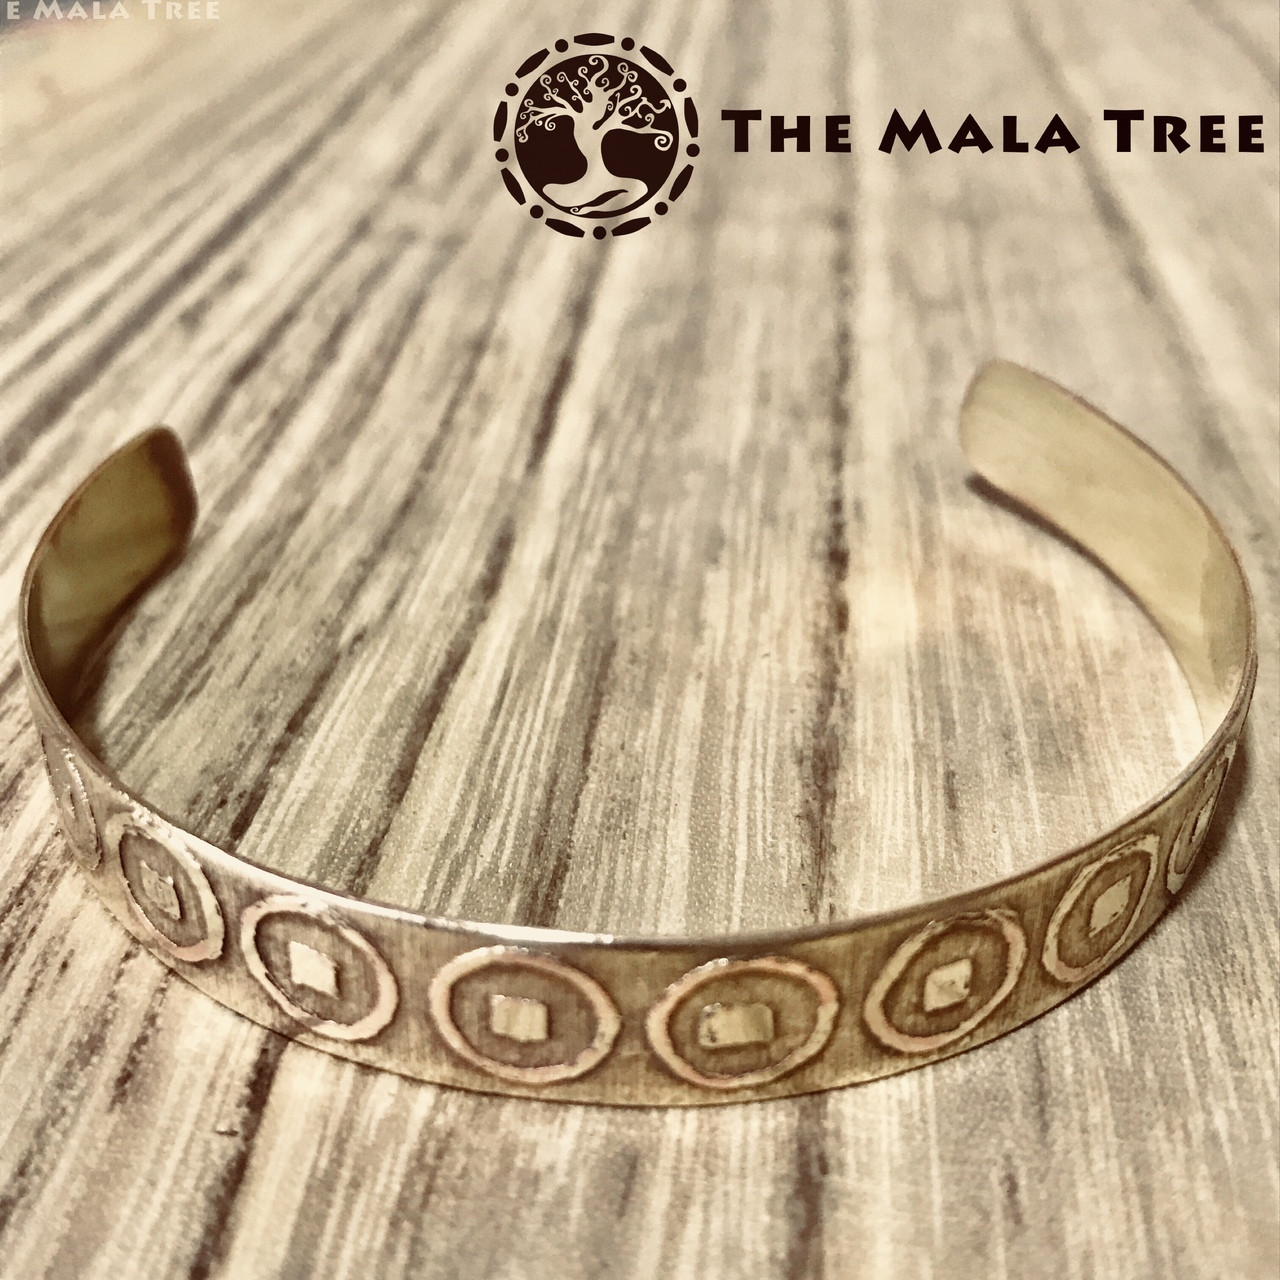 THE LUCKY COIN Brass Healing Bangle (Handmade) - The Mala Tree 1ec44bb58e3